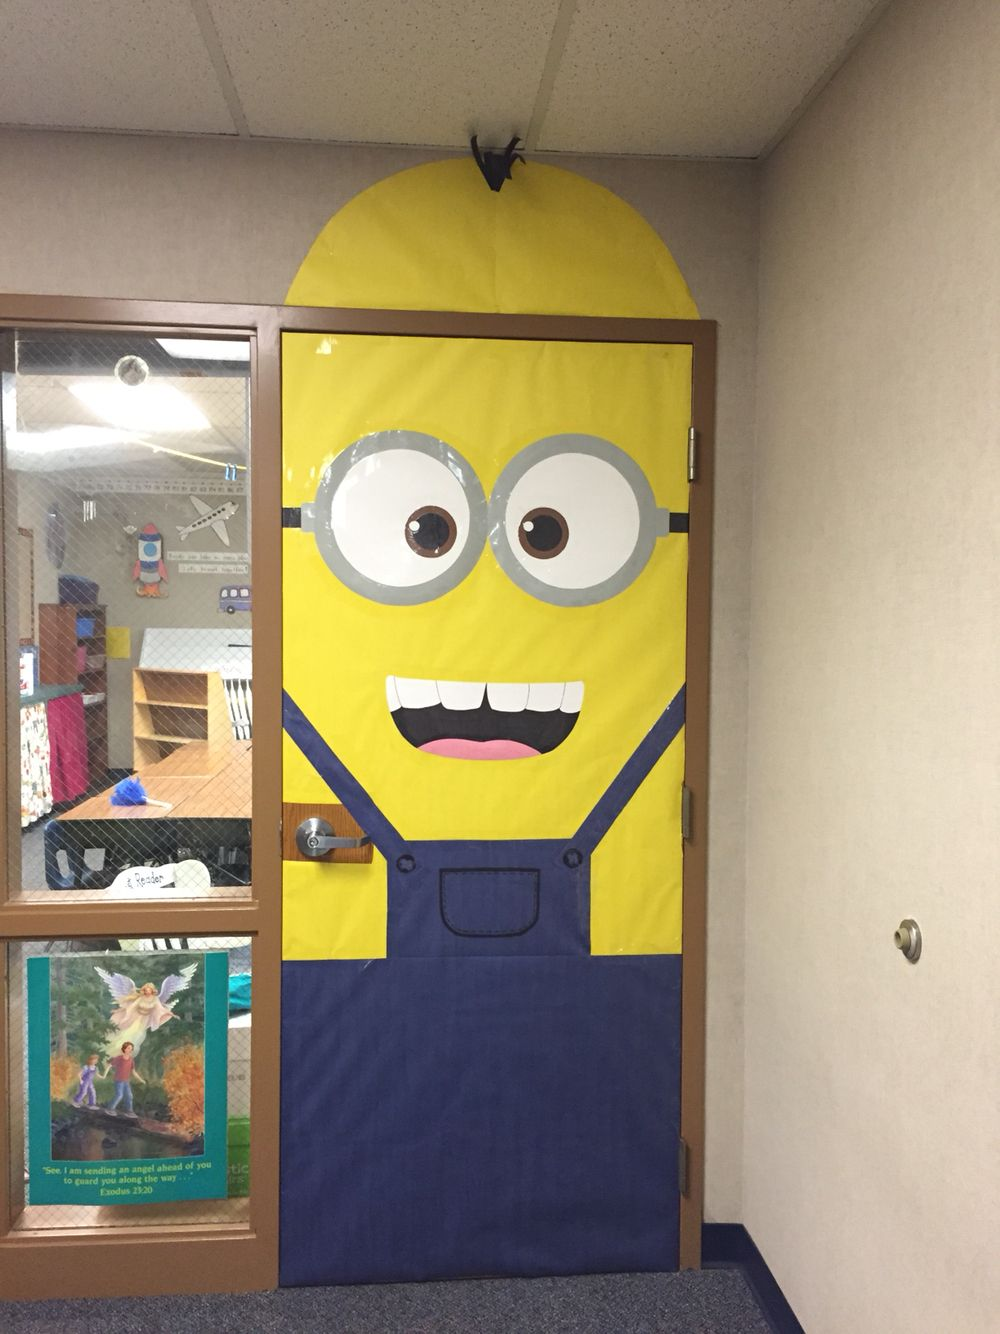 minion door decoration | Decoratingspecial.com